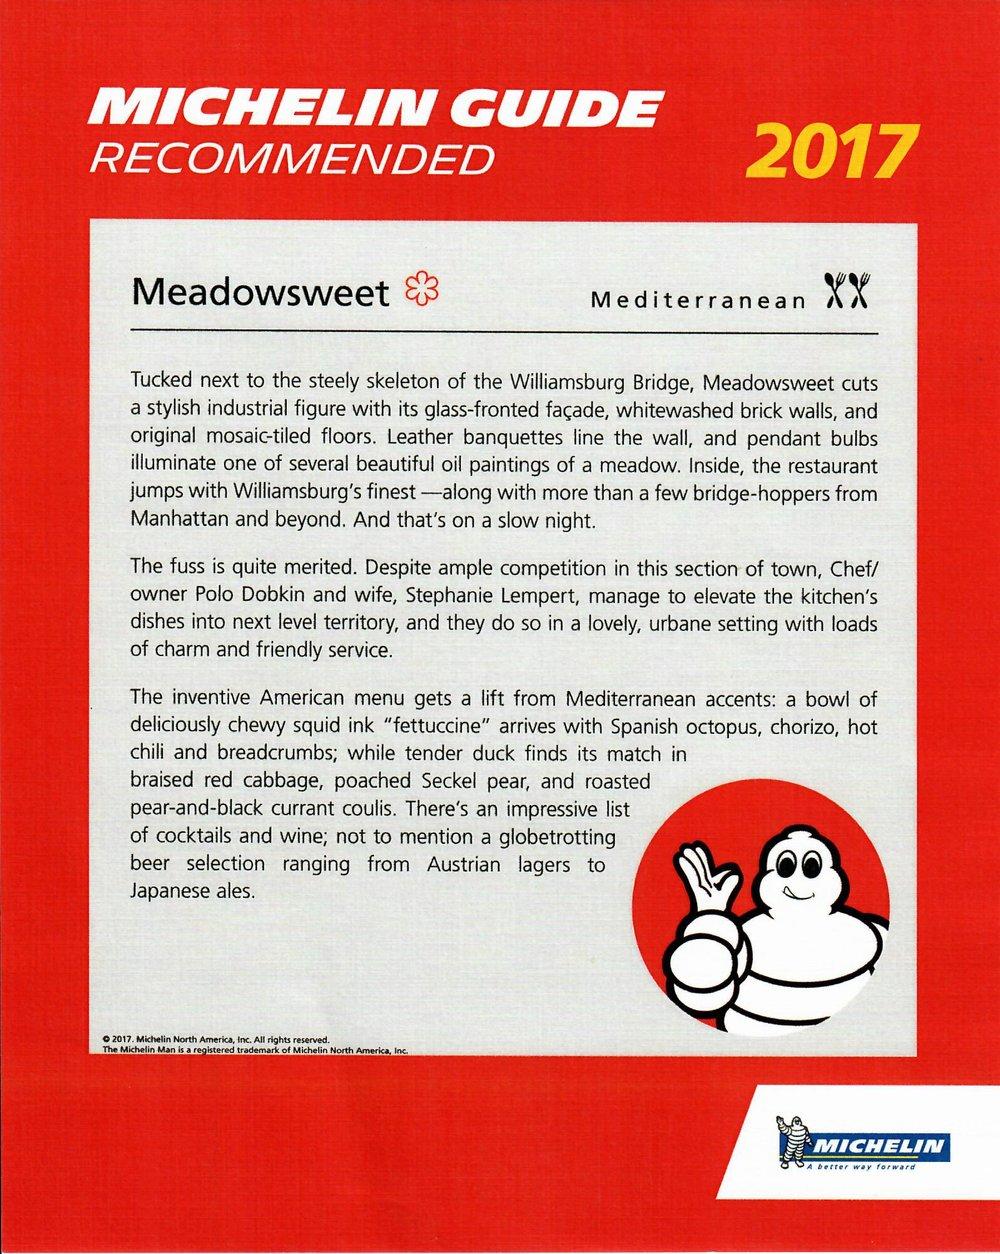 Michelin2017.jpg